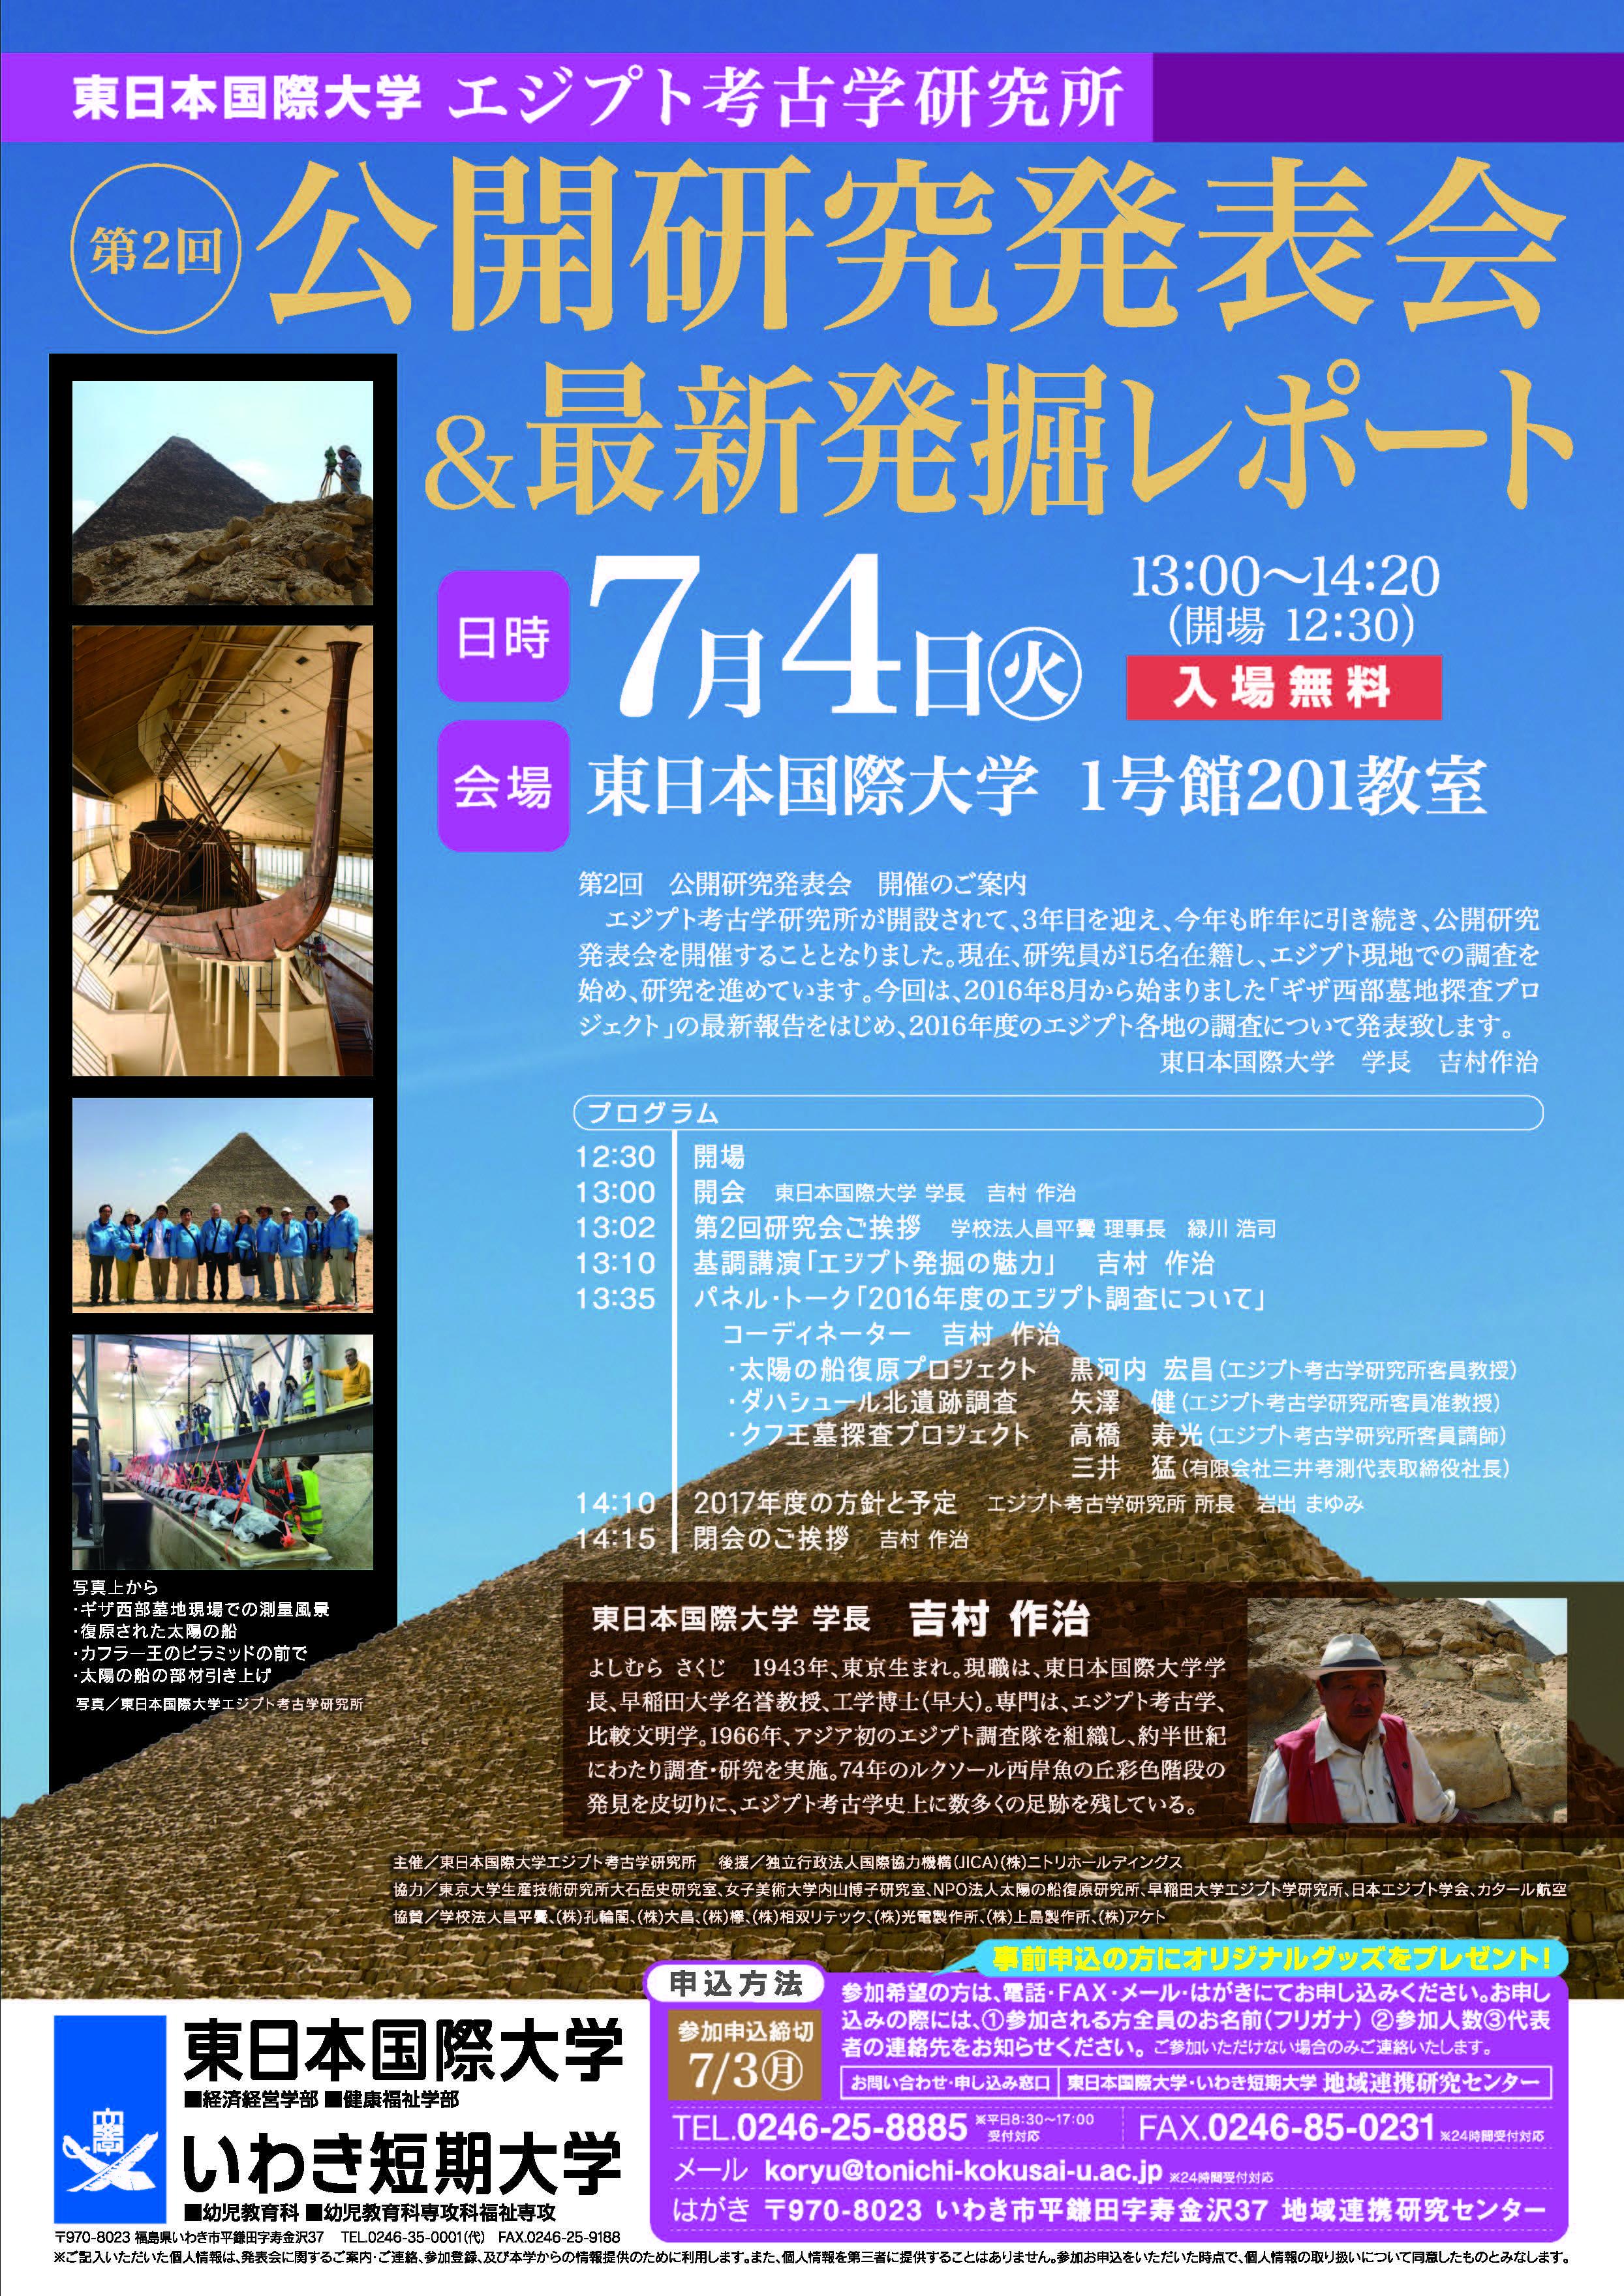 日本国際大学エジプト考古学研究所で第2回の公開研究発表会